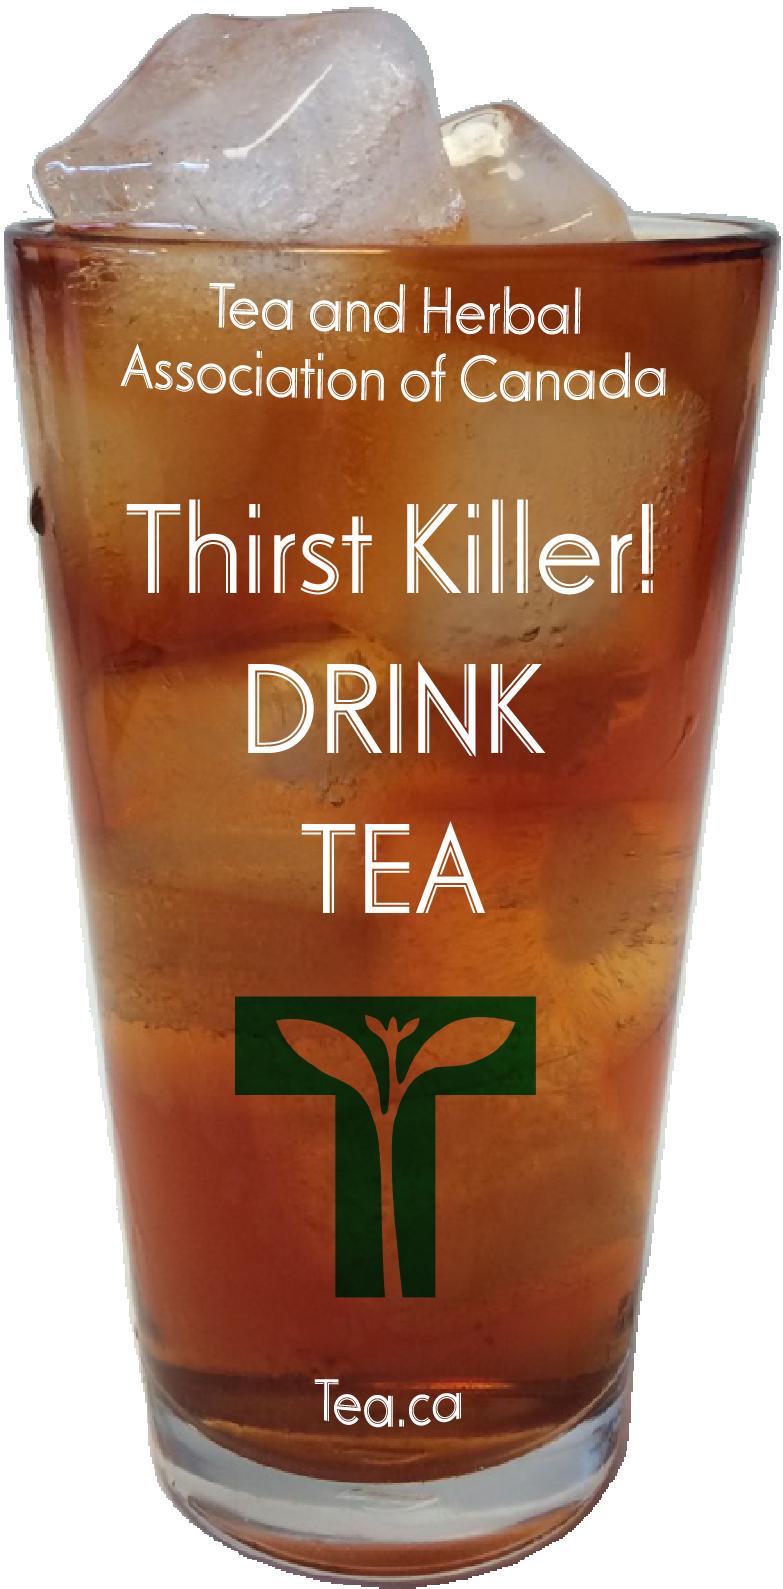 Thirst Killer! Drink Tea!